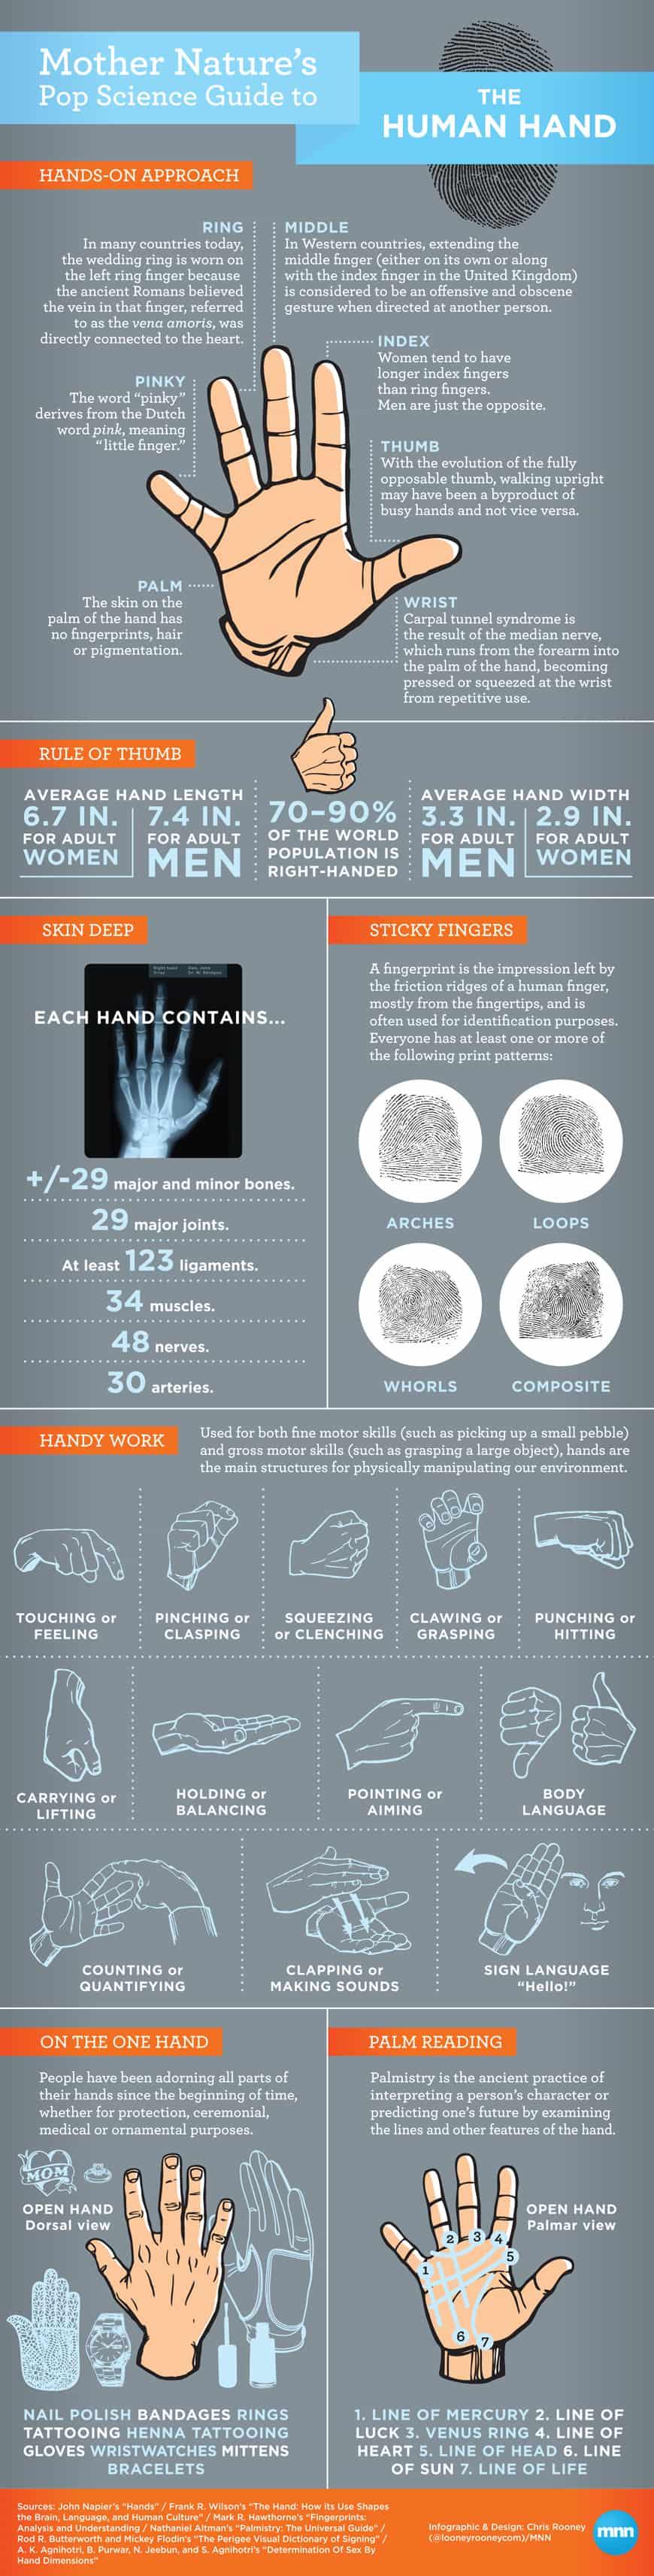 the human hand